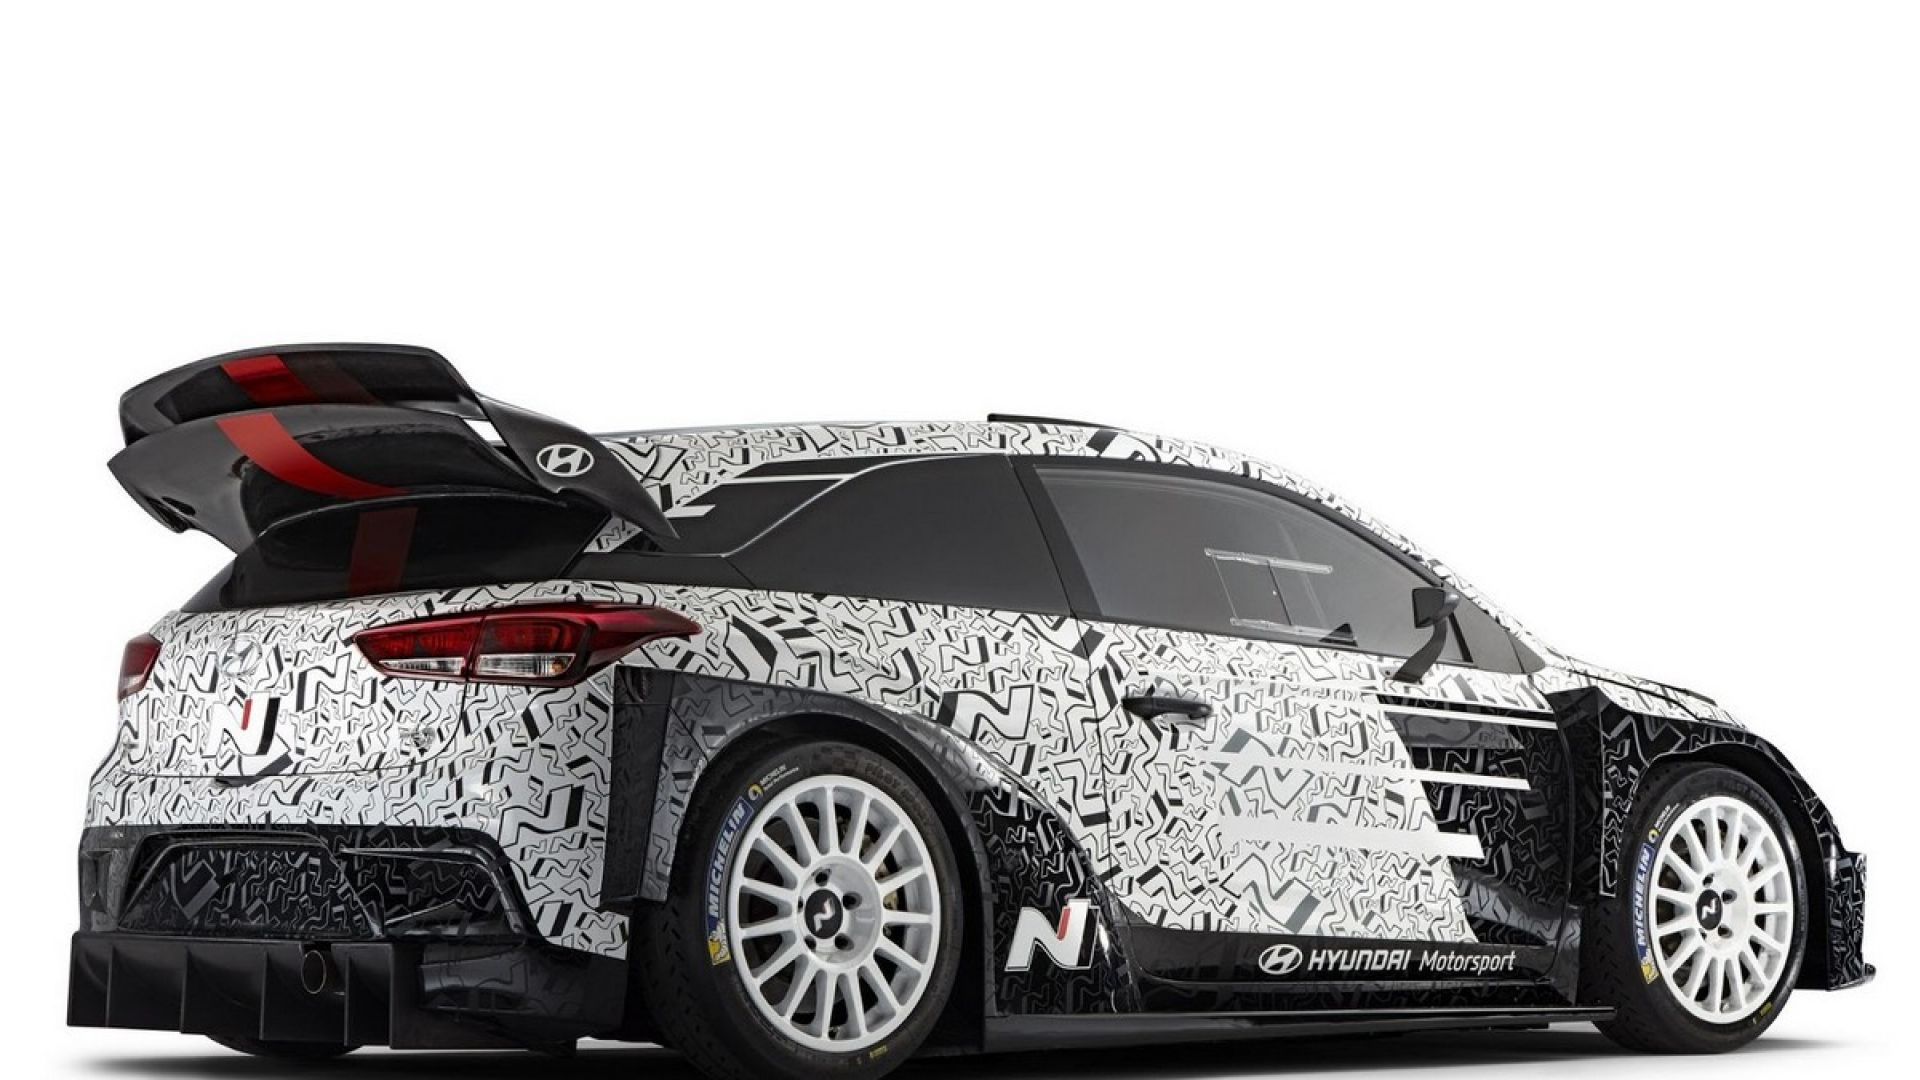 wrc 2017 hyundai presenter l 39 ultima vettura wrc 2017 al monza rally show motorbox. Black Bedroom Furniture Sets. Home Design Ideas